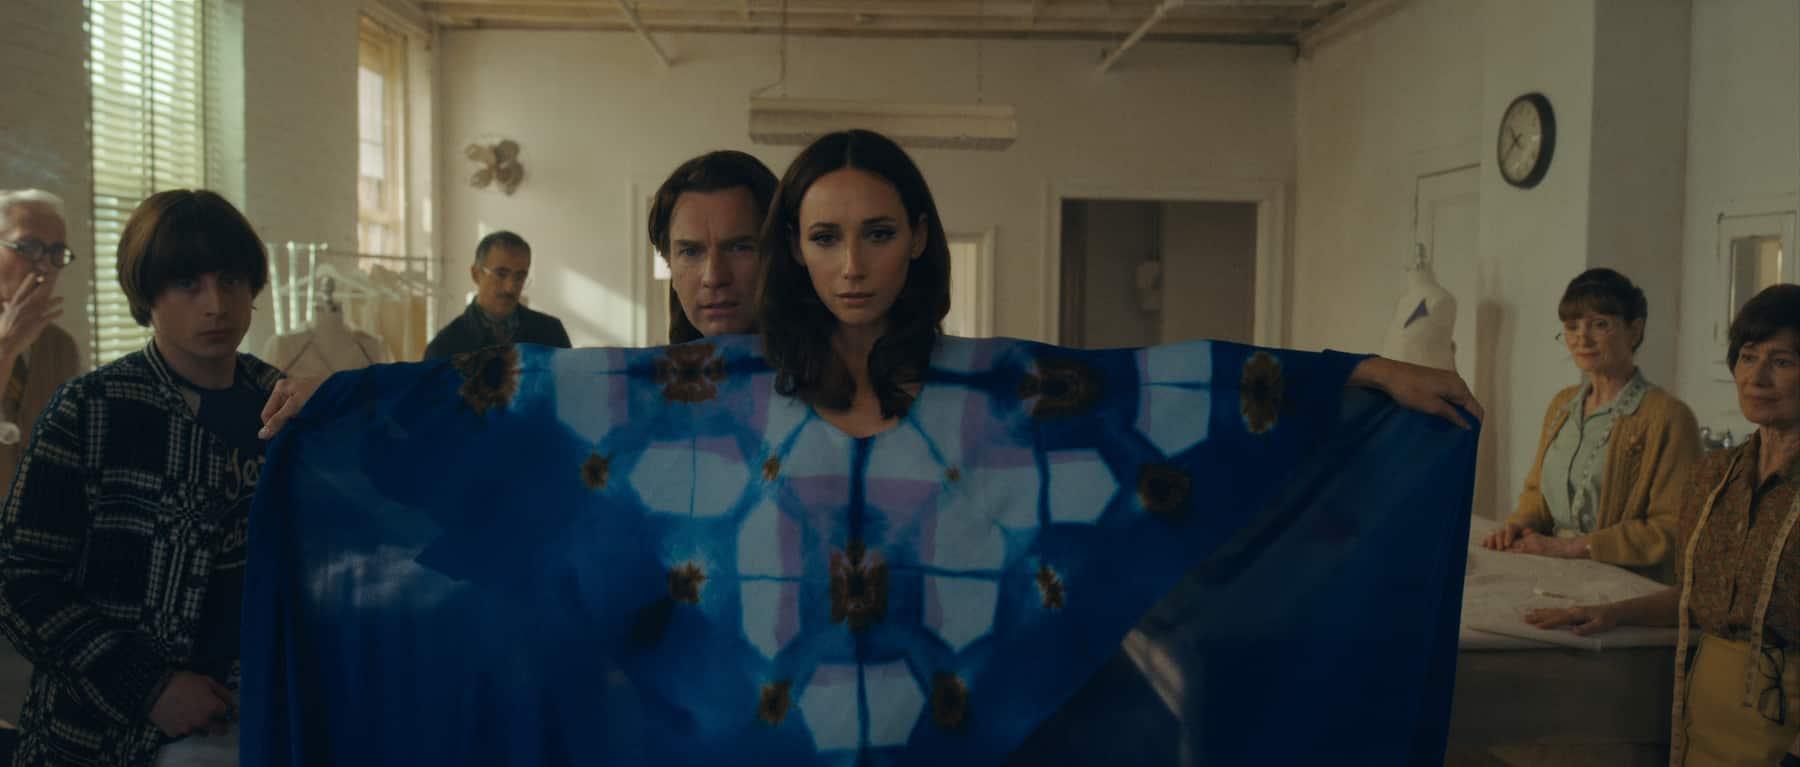 Rory Culkin as Joel Schumacher, David Pittu as Joe Eula, Ewan McGregor as Halston and Rebecca Dayan as Elsa Peretti in episode 101 of Halston.